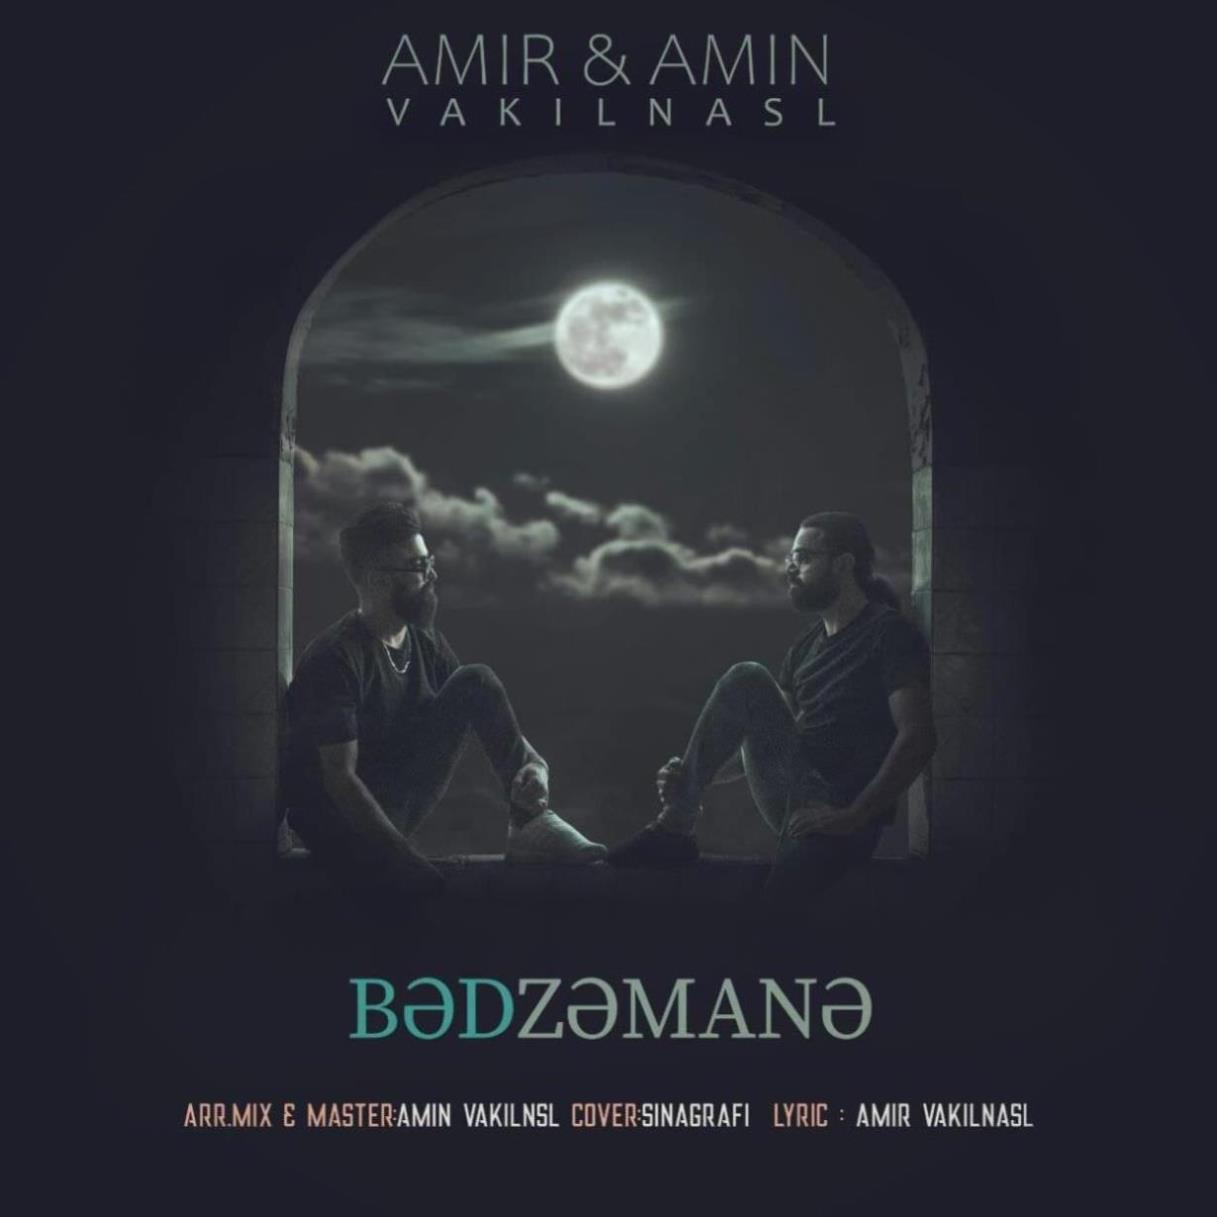 Amir & Amin Vakilnasl - Bedzemane